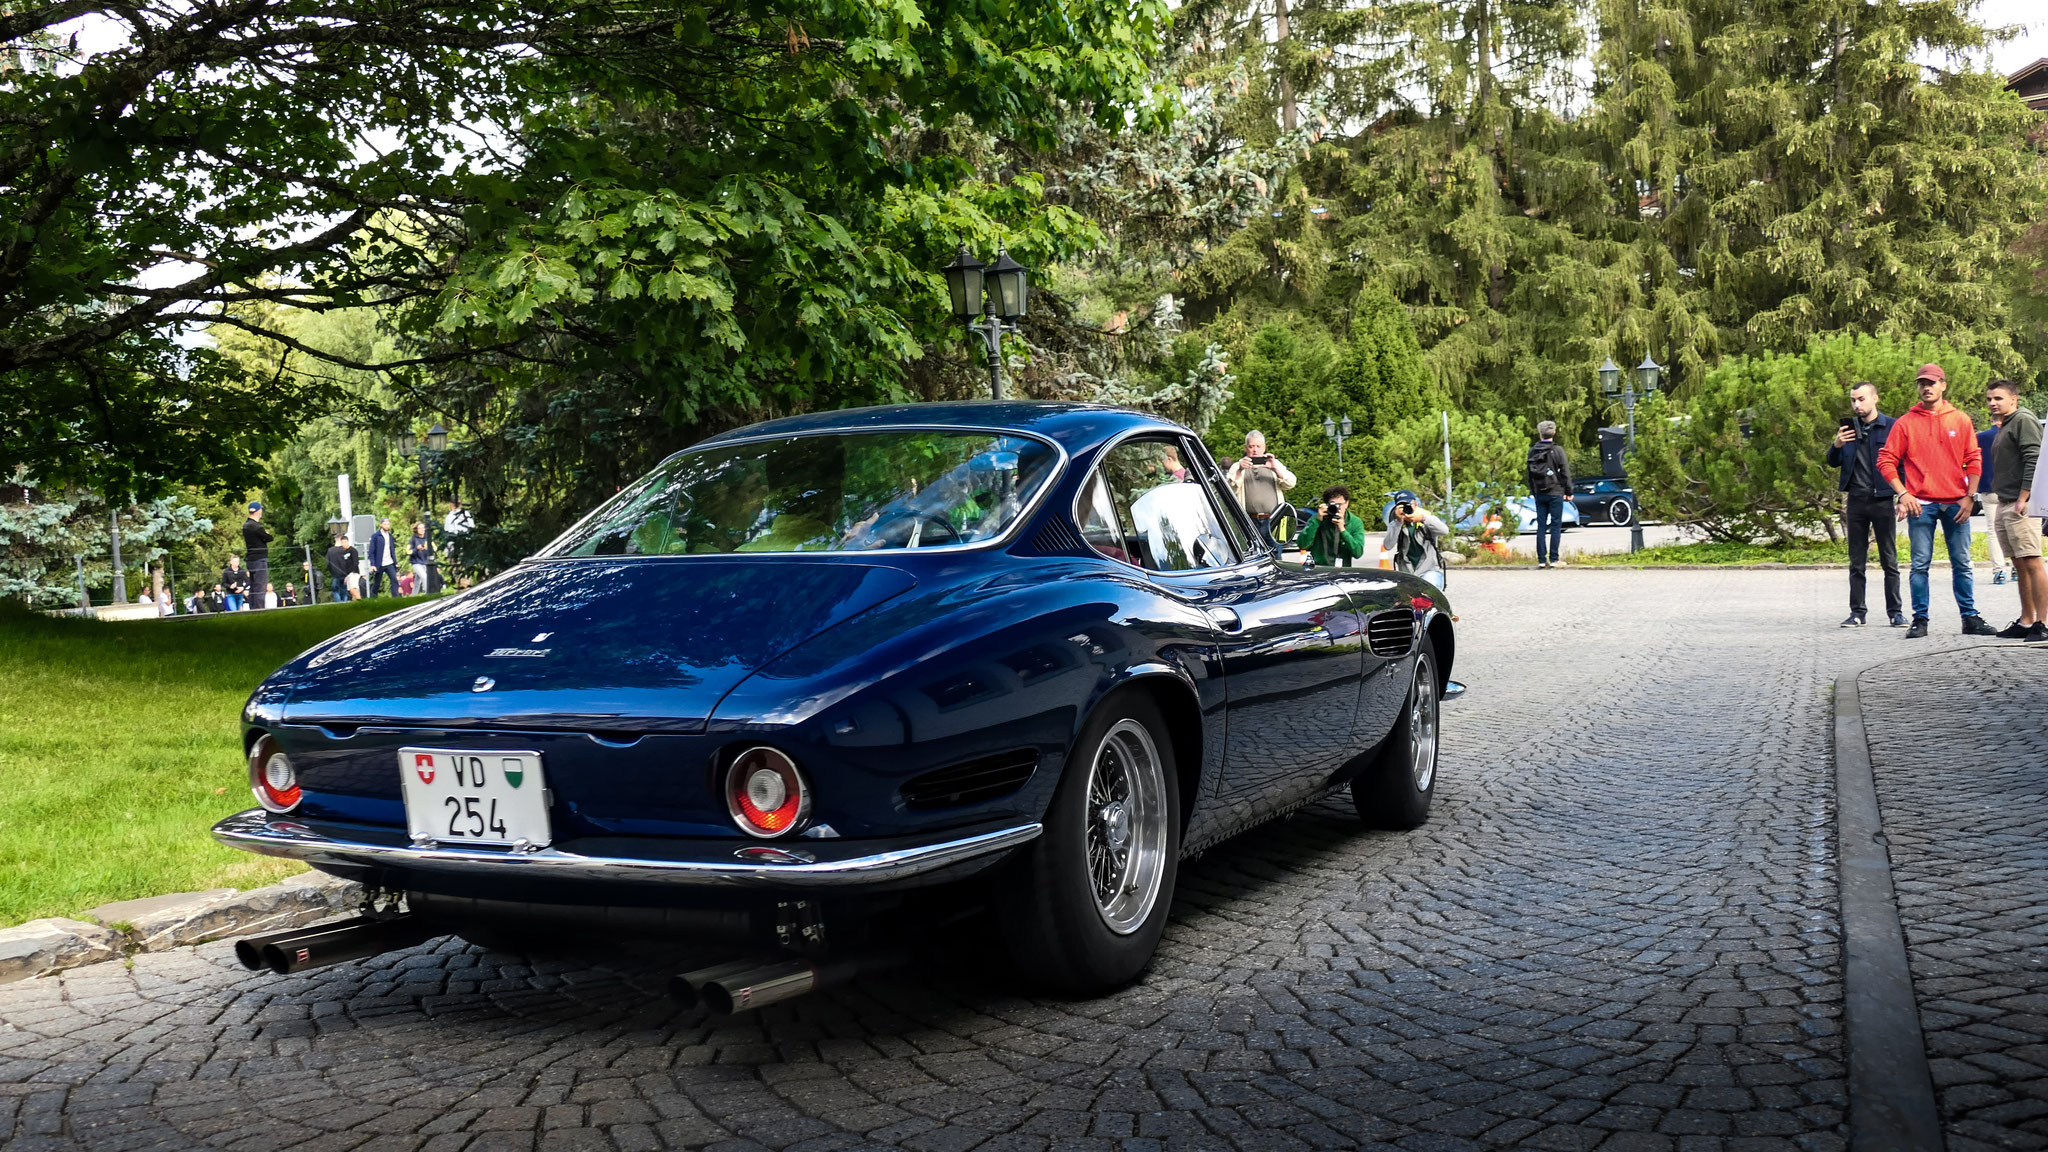 Ferrari 250 GT SWB Berlinetta Speciale - VD-254 (CH)